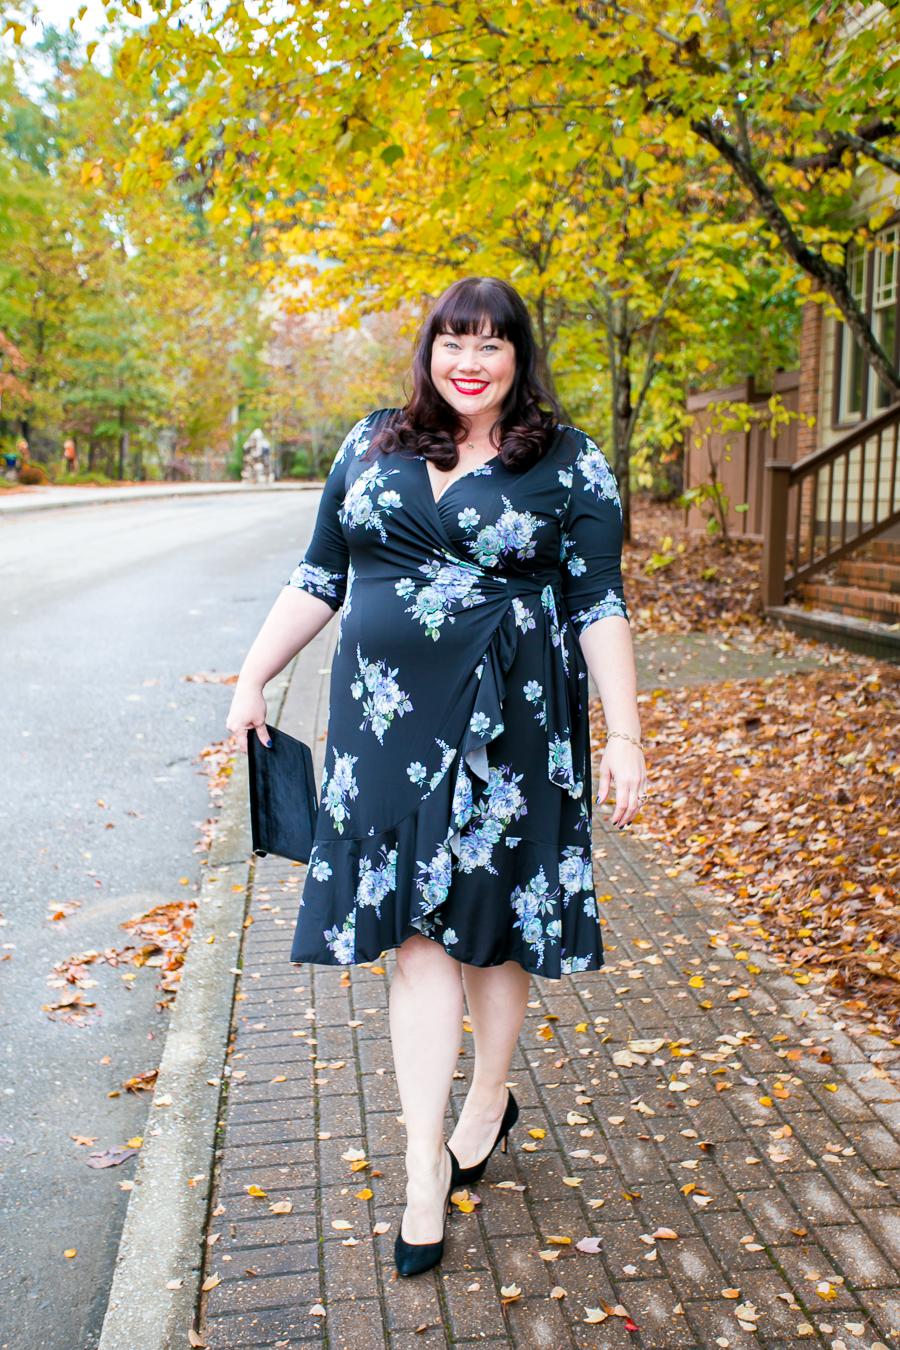 Kiyonna, plus size wrap dress, Fall Fashion, Plus Size Style, Plus Size Fashion, Style Plus Curves, Chicago Blogger, Chicago Plus Size Blogger, Plus Size Blogger, Amber McCulloch